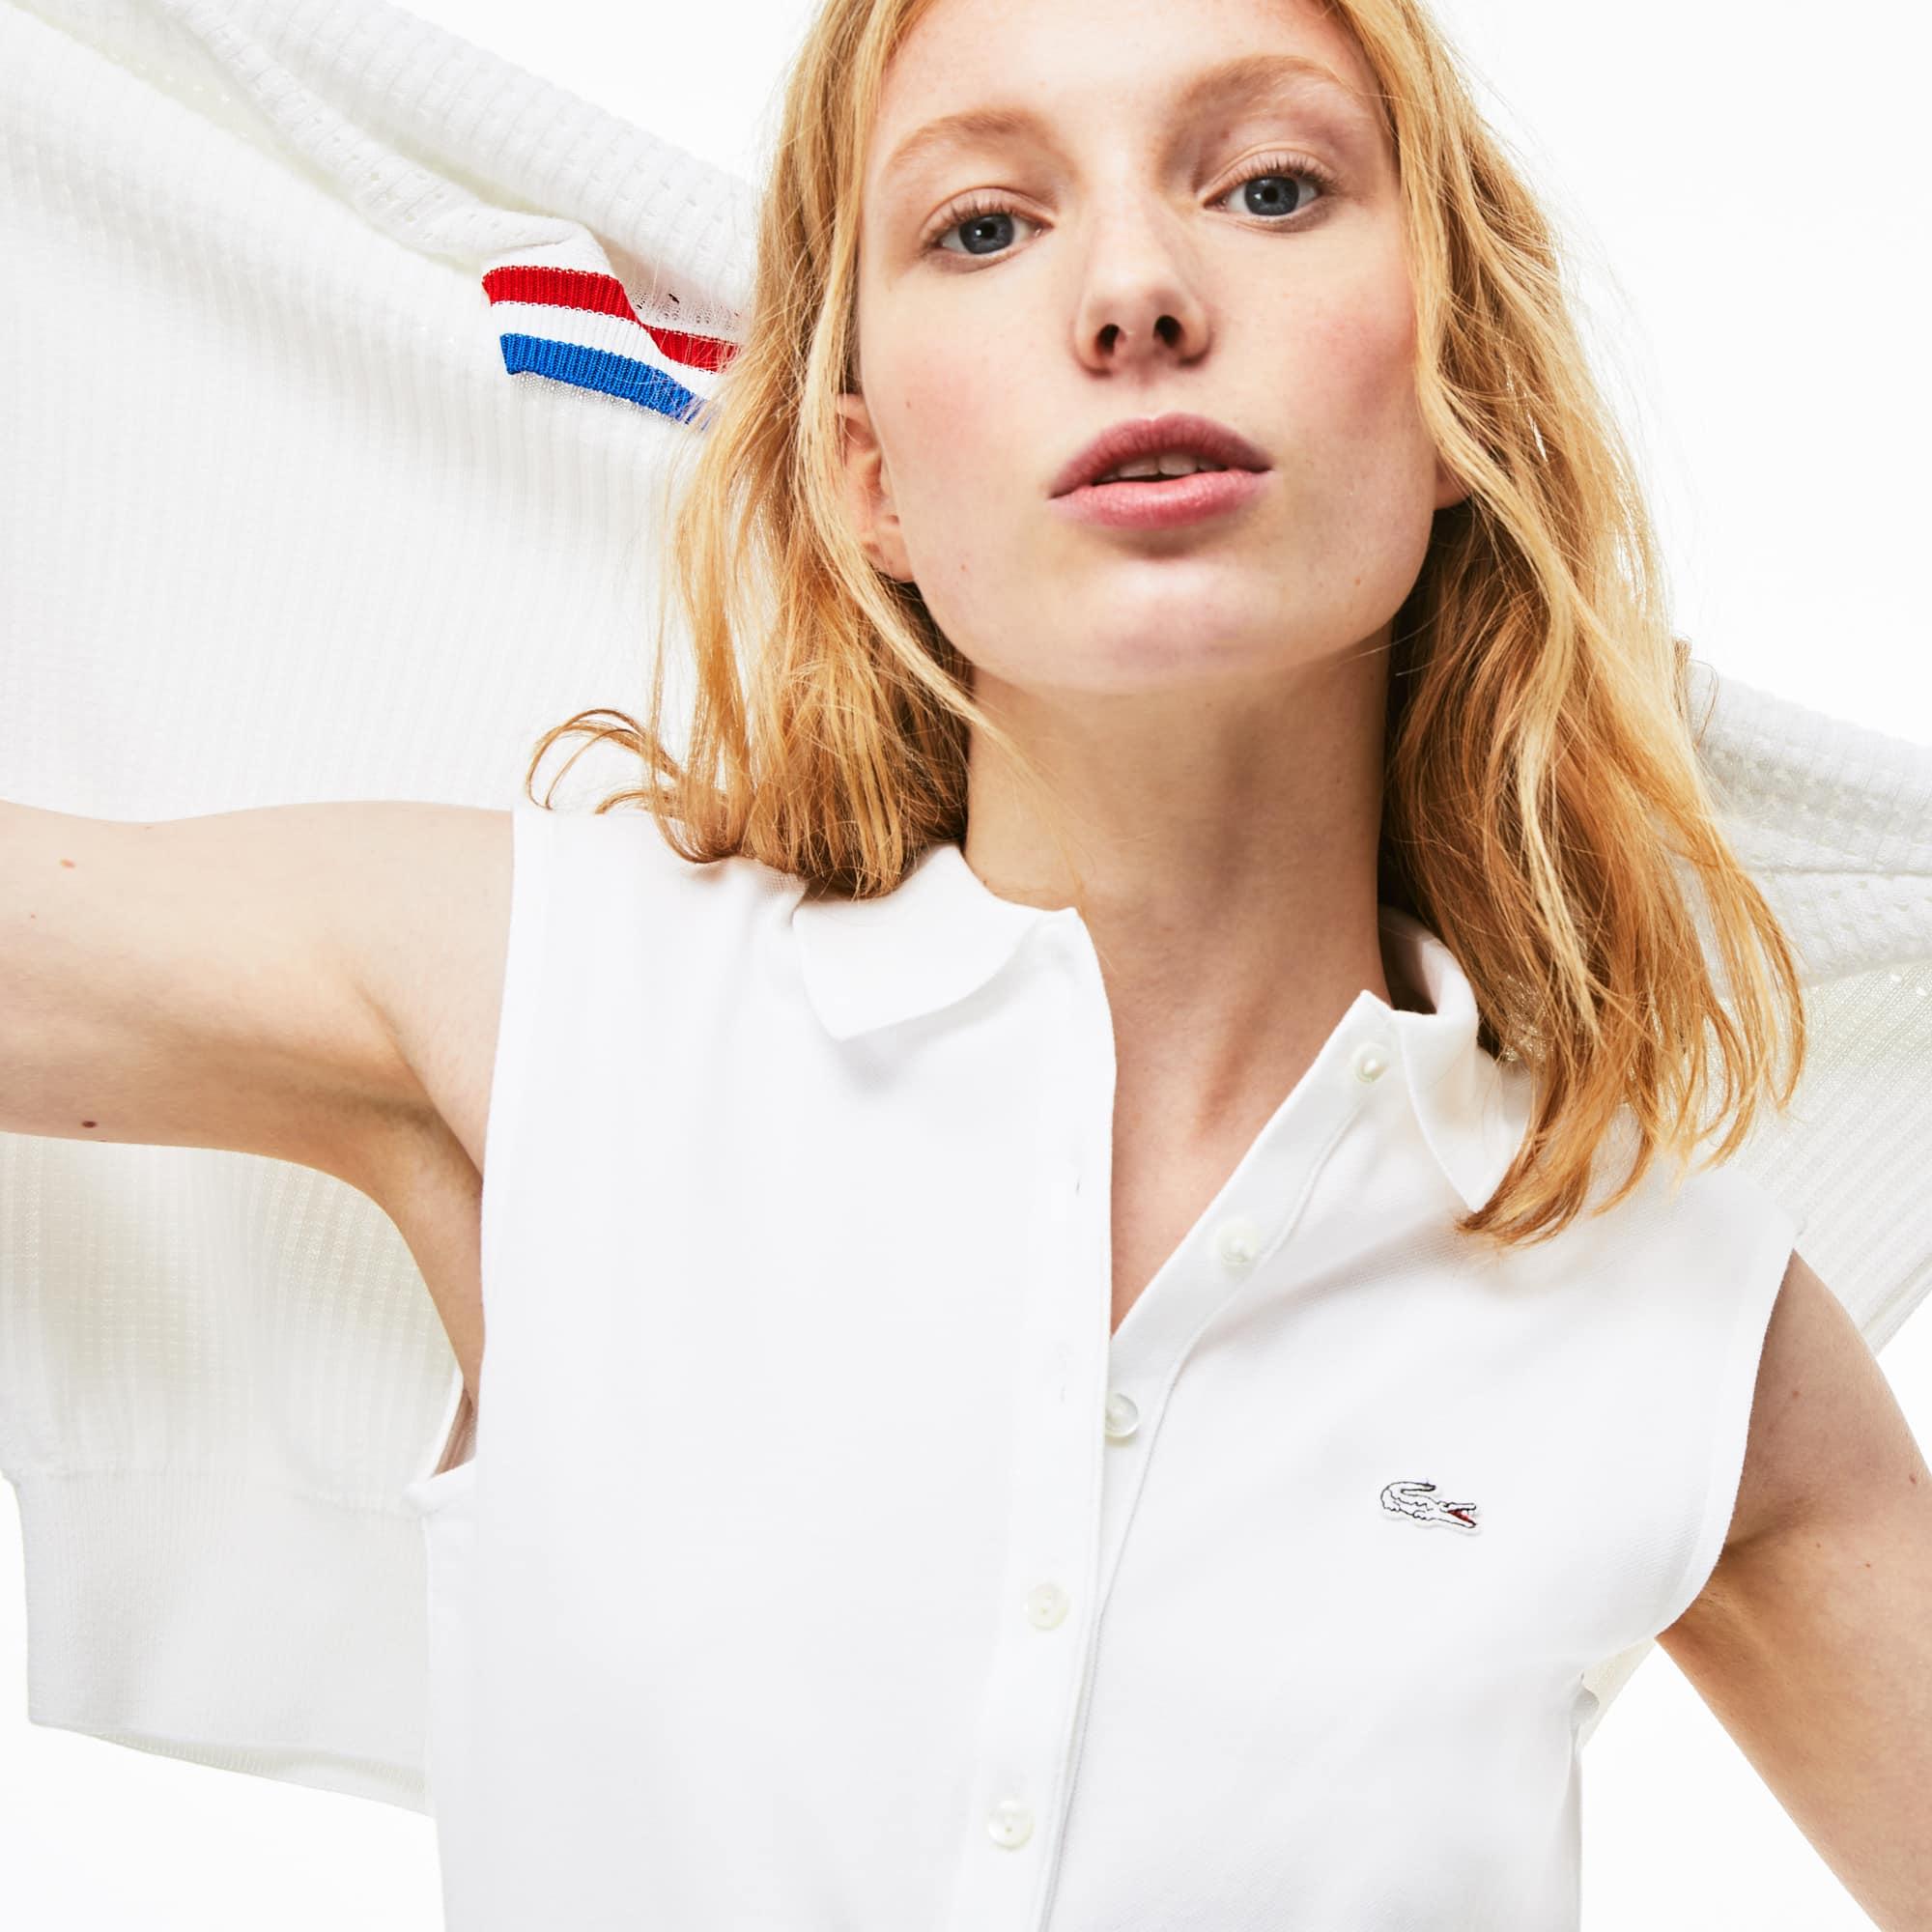 650e3429e Women's Lacoste Slim Fit Stretch Mini Piqué Polo Shirt   LACOSTE